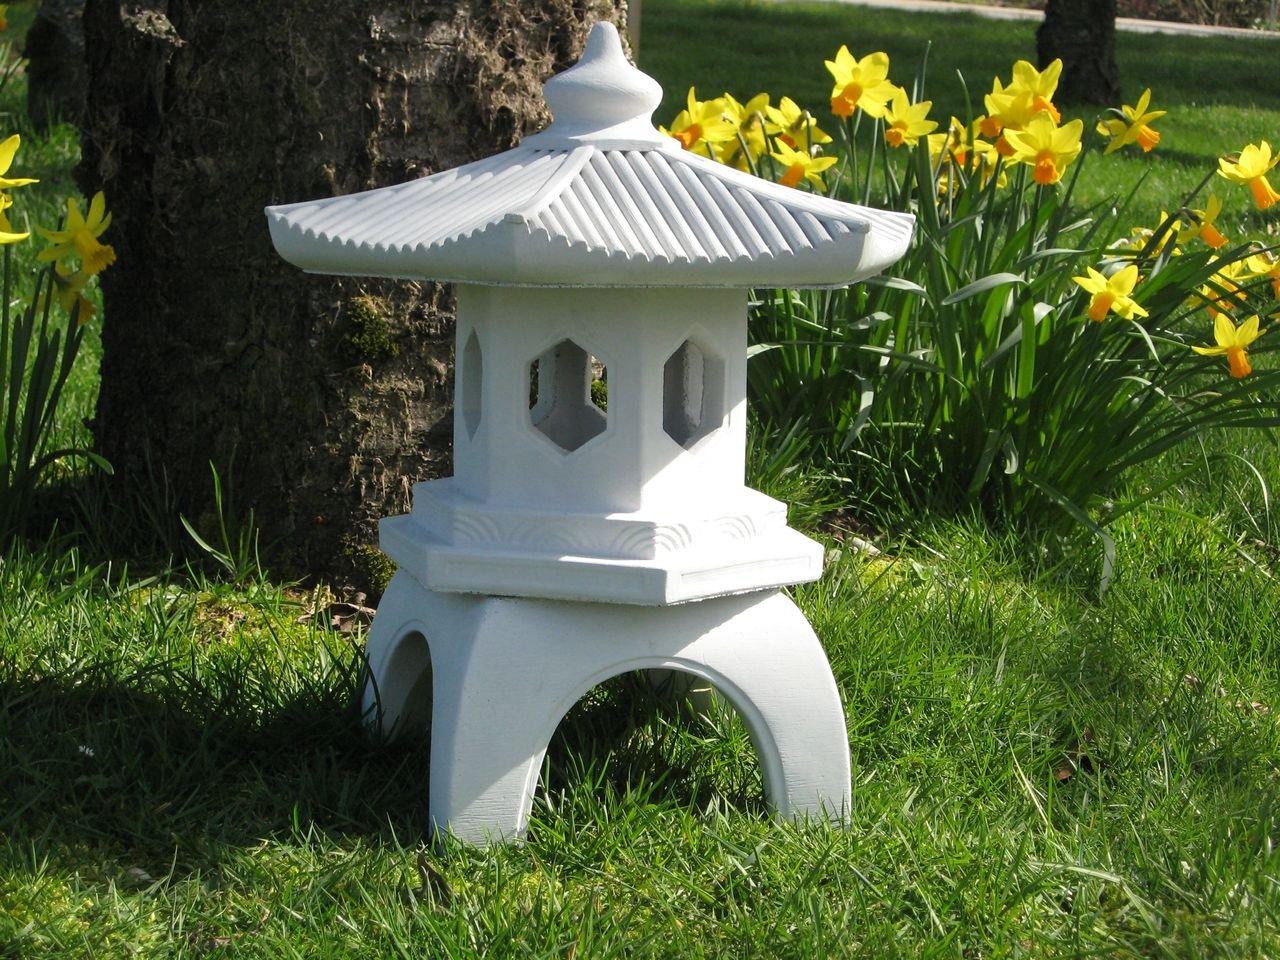 Cement PAGODA Lantern 16''H, 3-piece GRAY CONCRETE Outdoor Garden Statue by StoneWorks